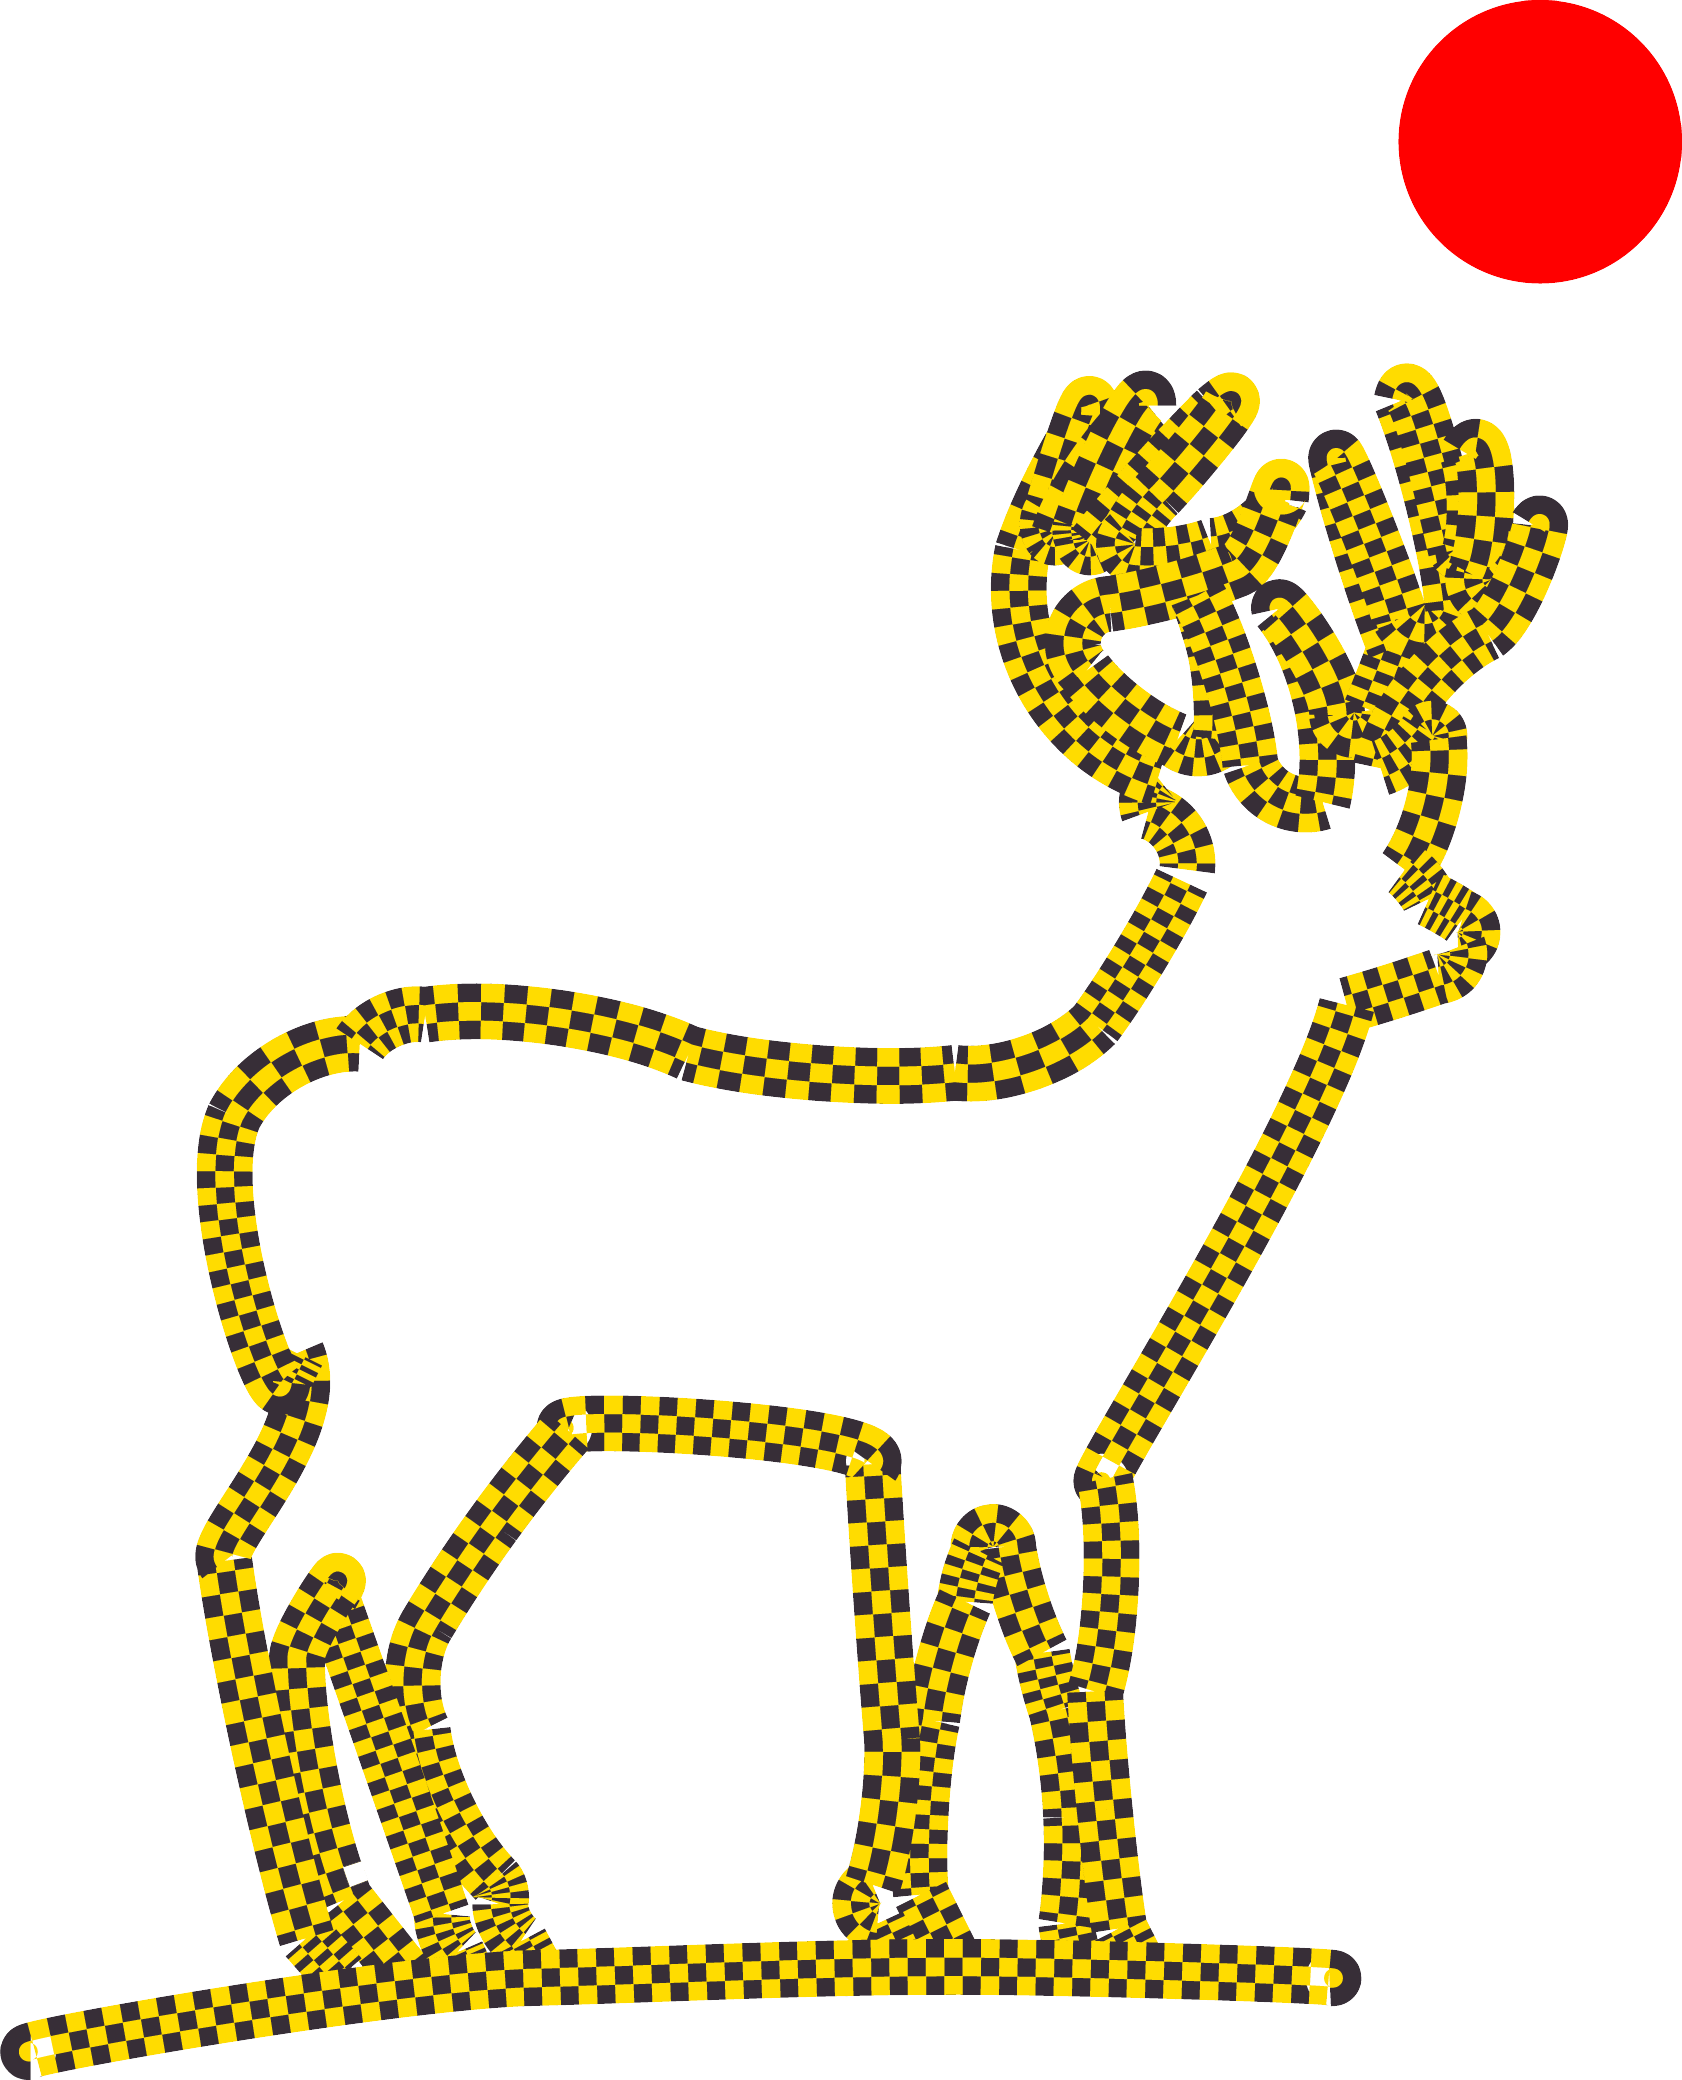 elda bellone-LUNAROSSA-28x32-digital print